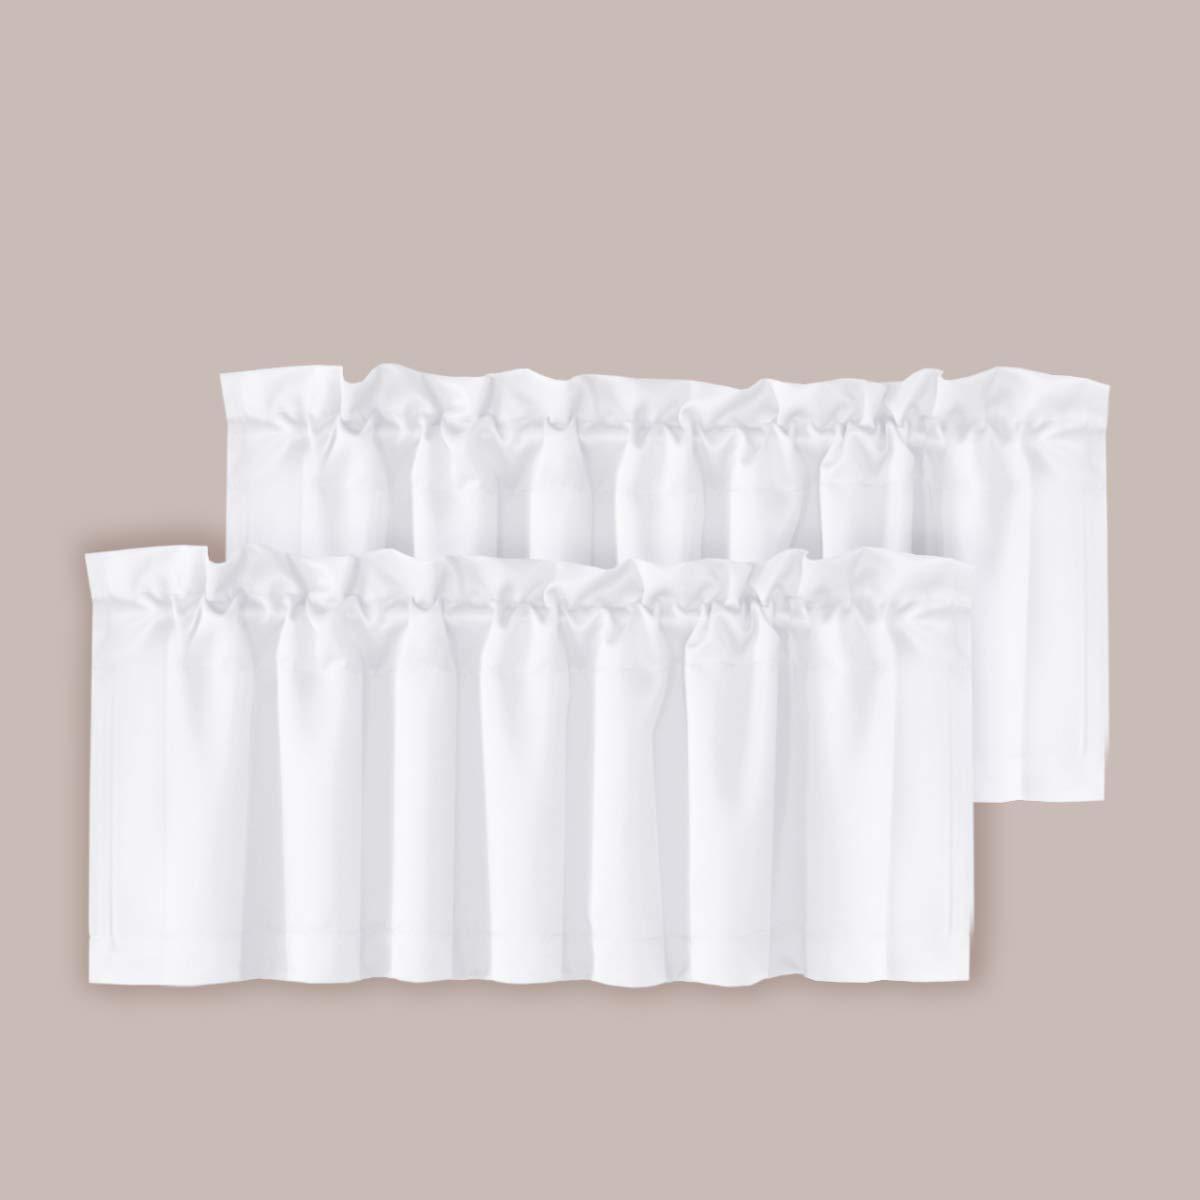 H.VERSAILTEX Room Darkening Blackout Window Curtain Valances for Living Room/Bedroom, 2 Pack, 52 inch x 18 inch, Pure White by H.VERSAILTEX